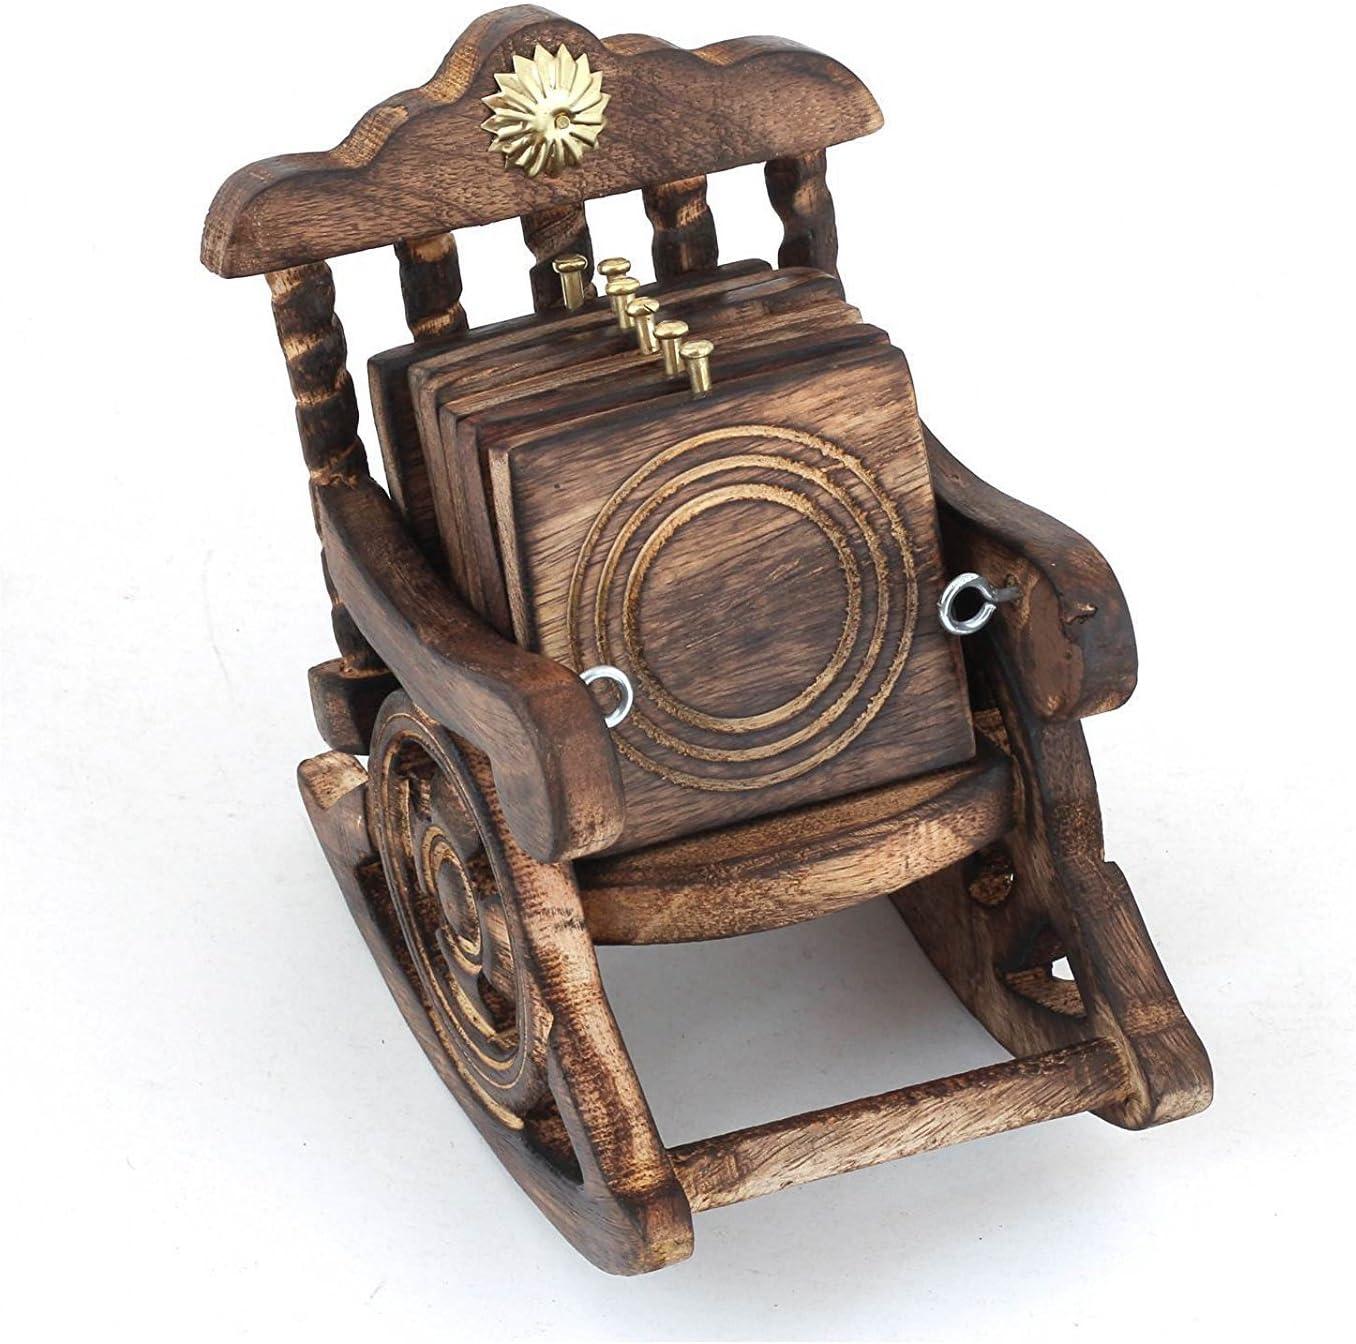 GoRevizon Wooden Antique Look Chair Shape Coaster Set Gift Item